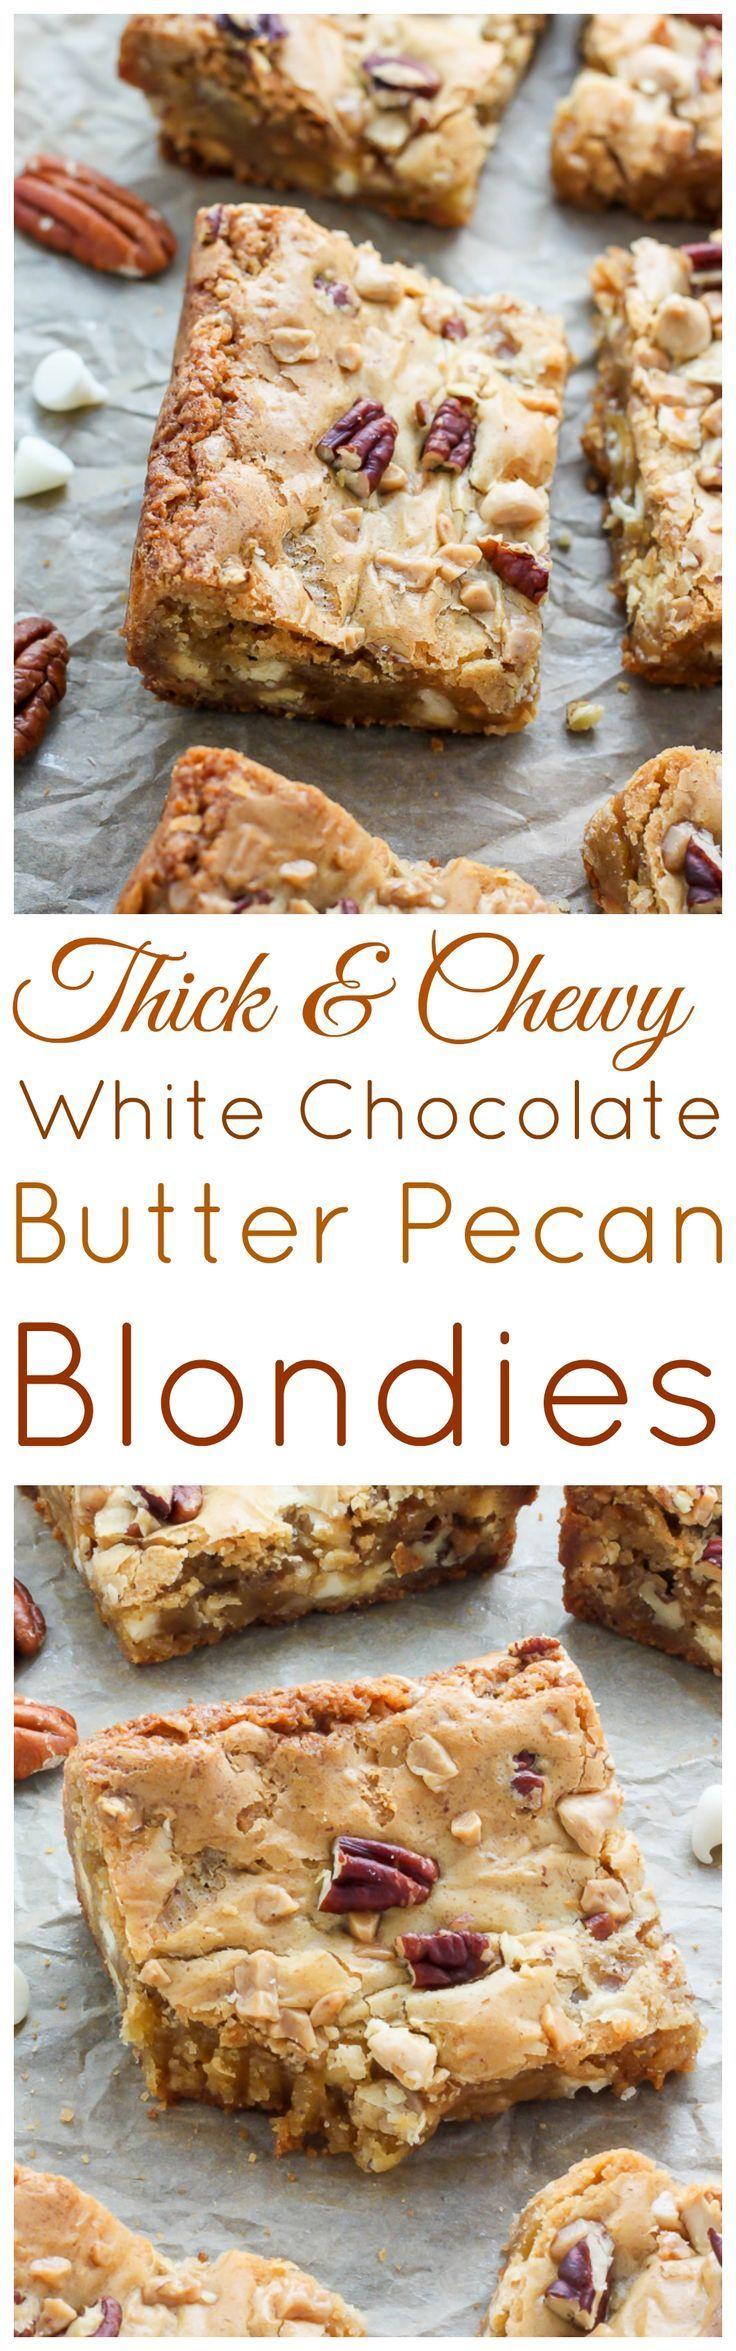 130 best Brownie & Blondie Recipes images on Pinterest